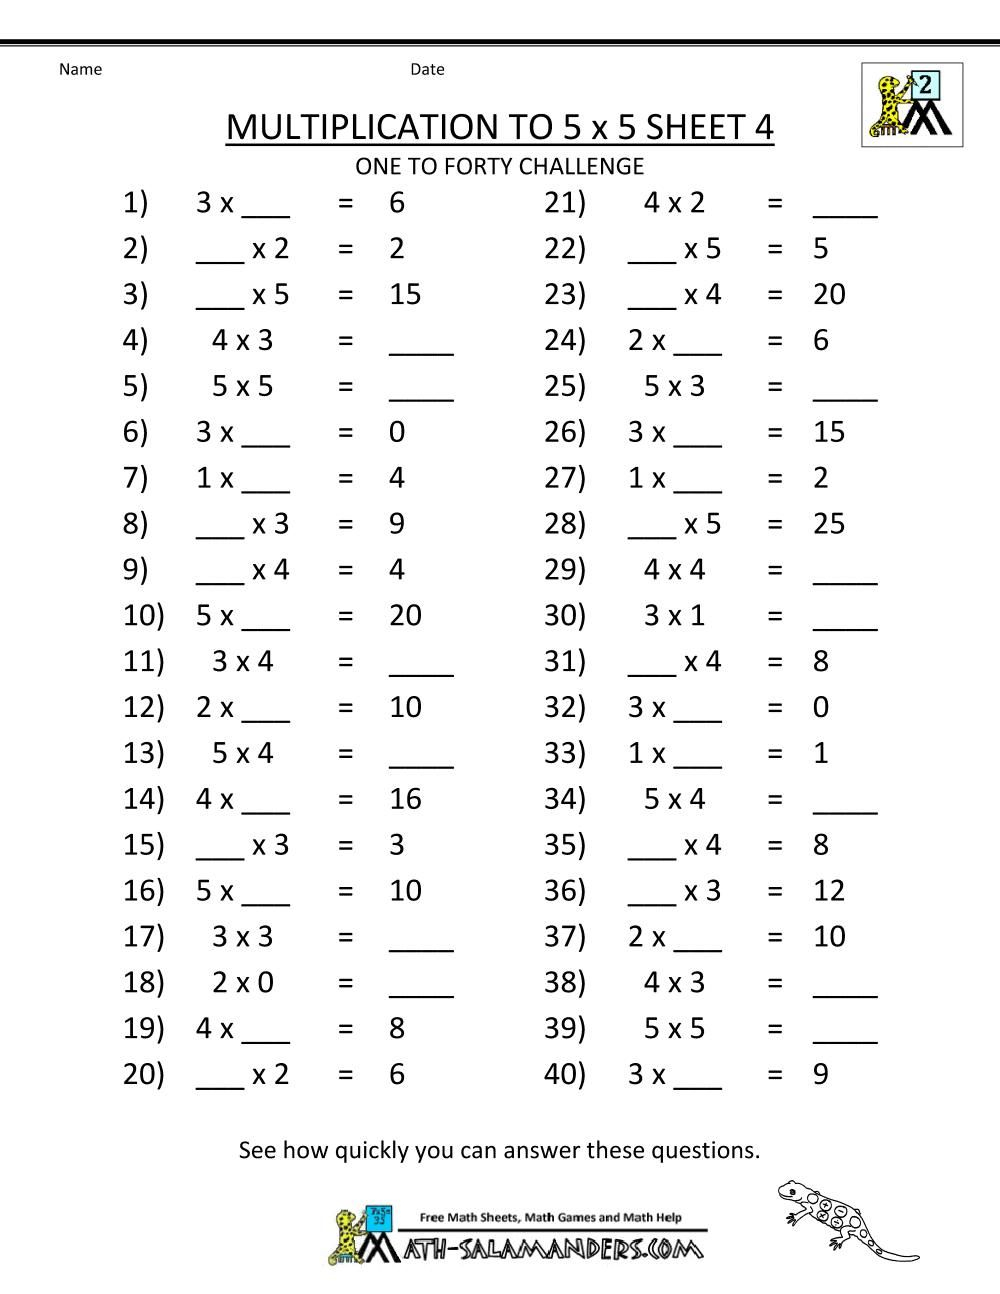 Multiplication Worksheets Grade 3 Coloring | 3Rd Grade Math inside Printable 3 Multiplication Worksheets